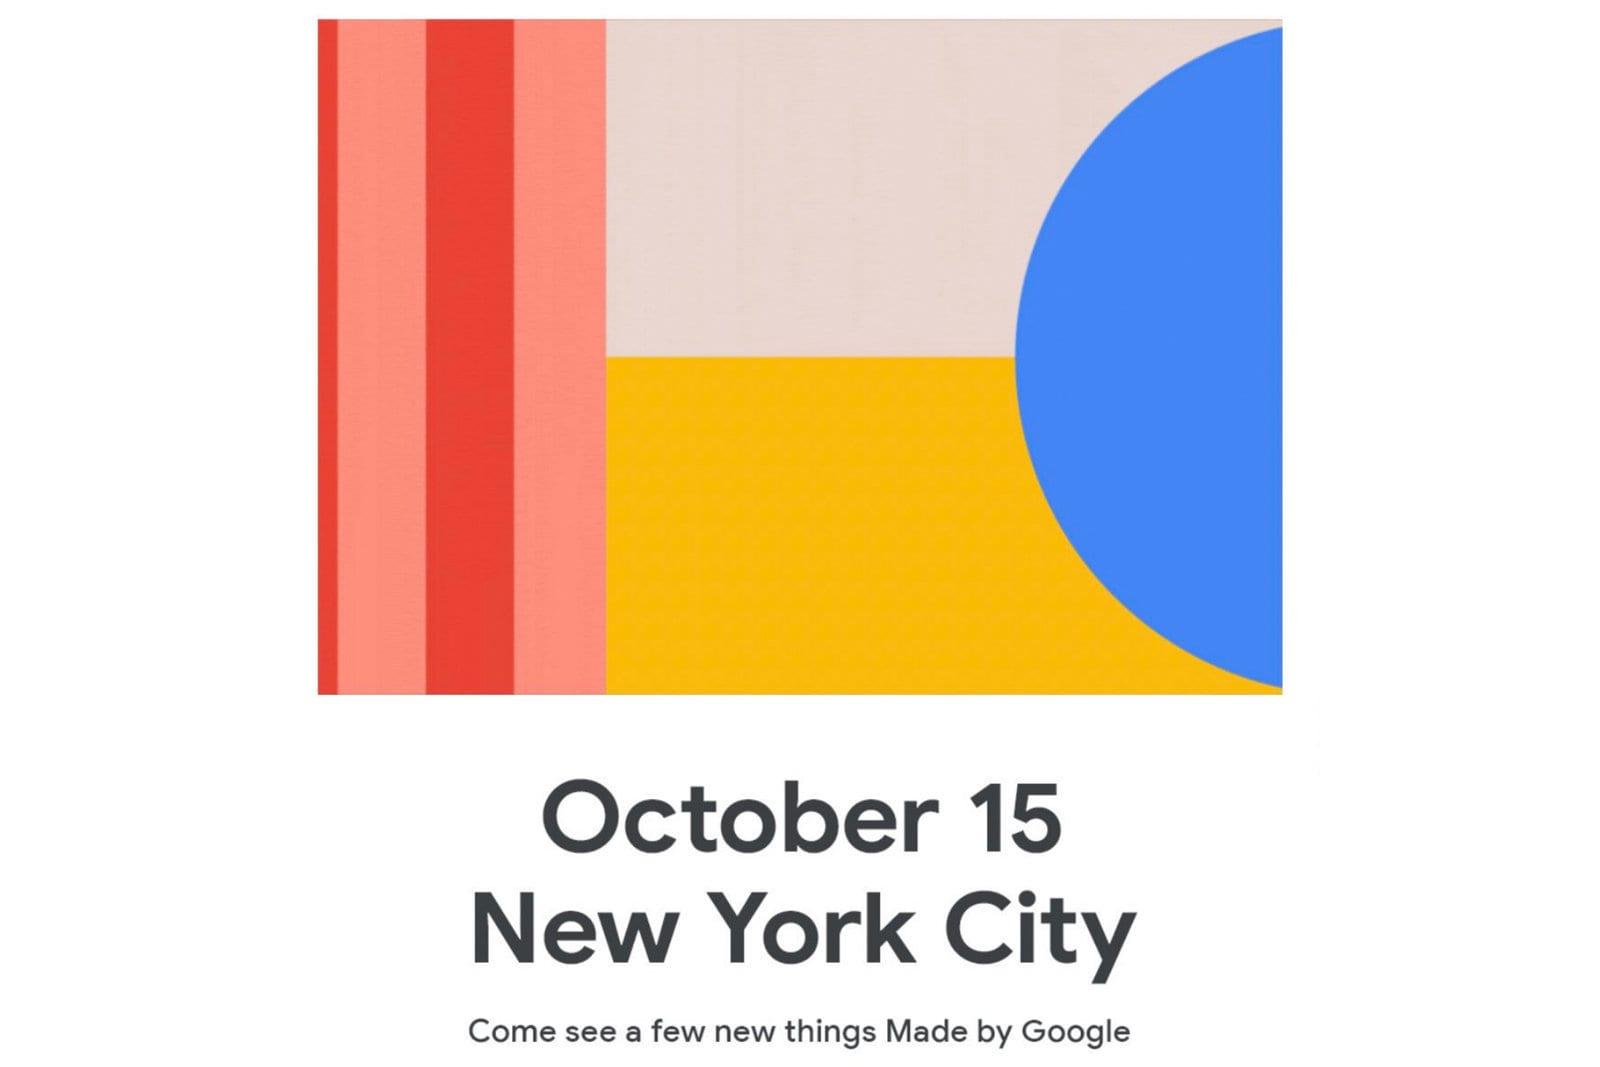 Google a lansat campania #SwitchtoPixel, în avans față de noile telefoane Pixel 4 și Pixel 4XL